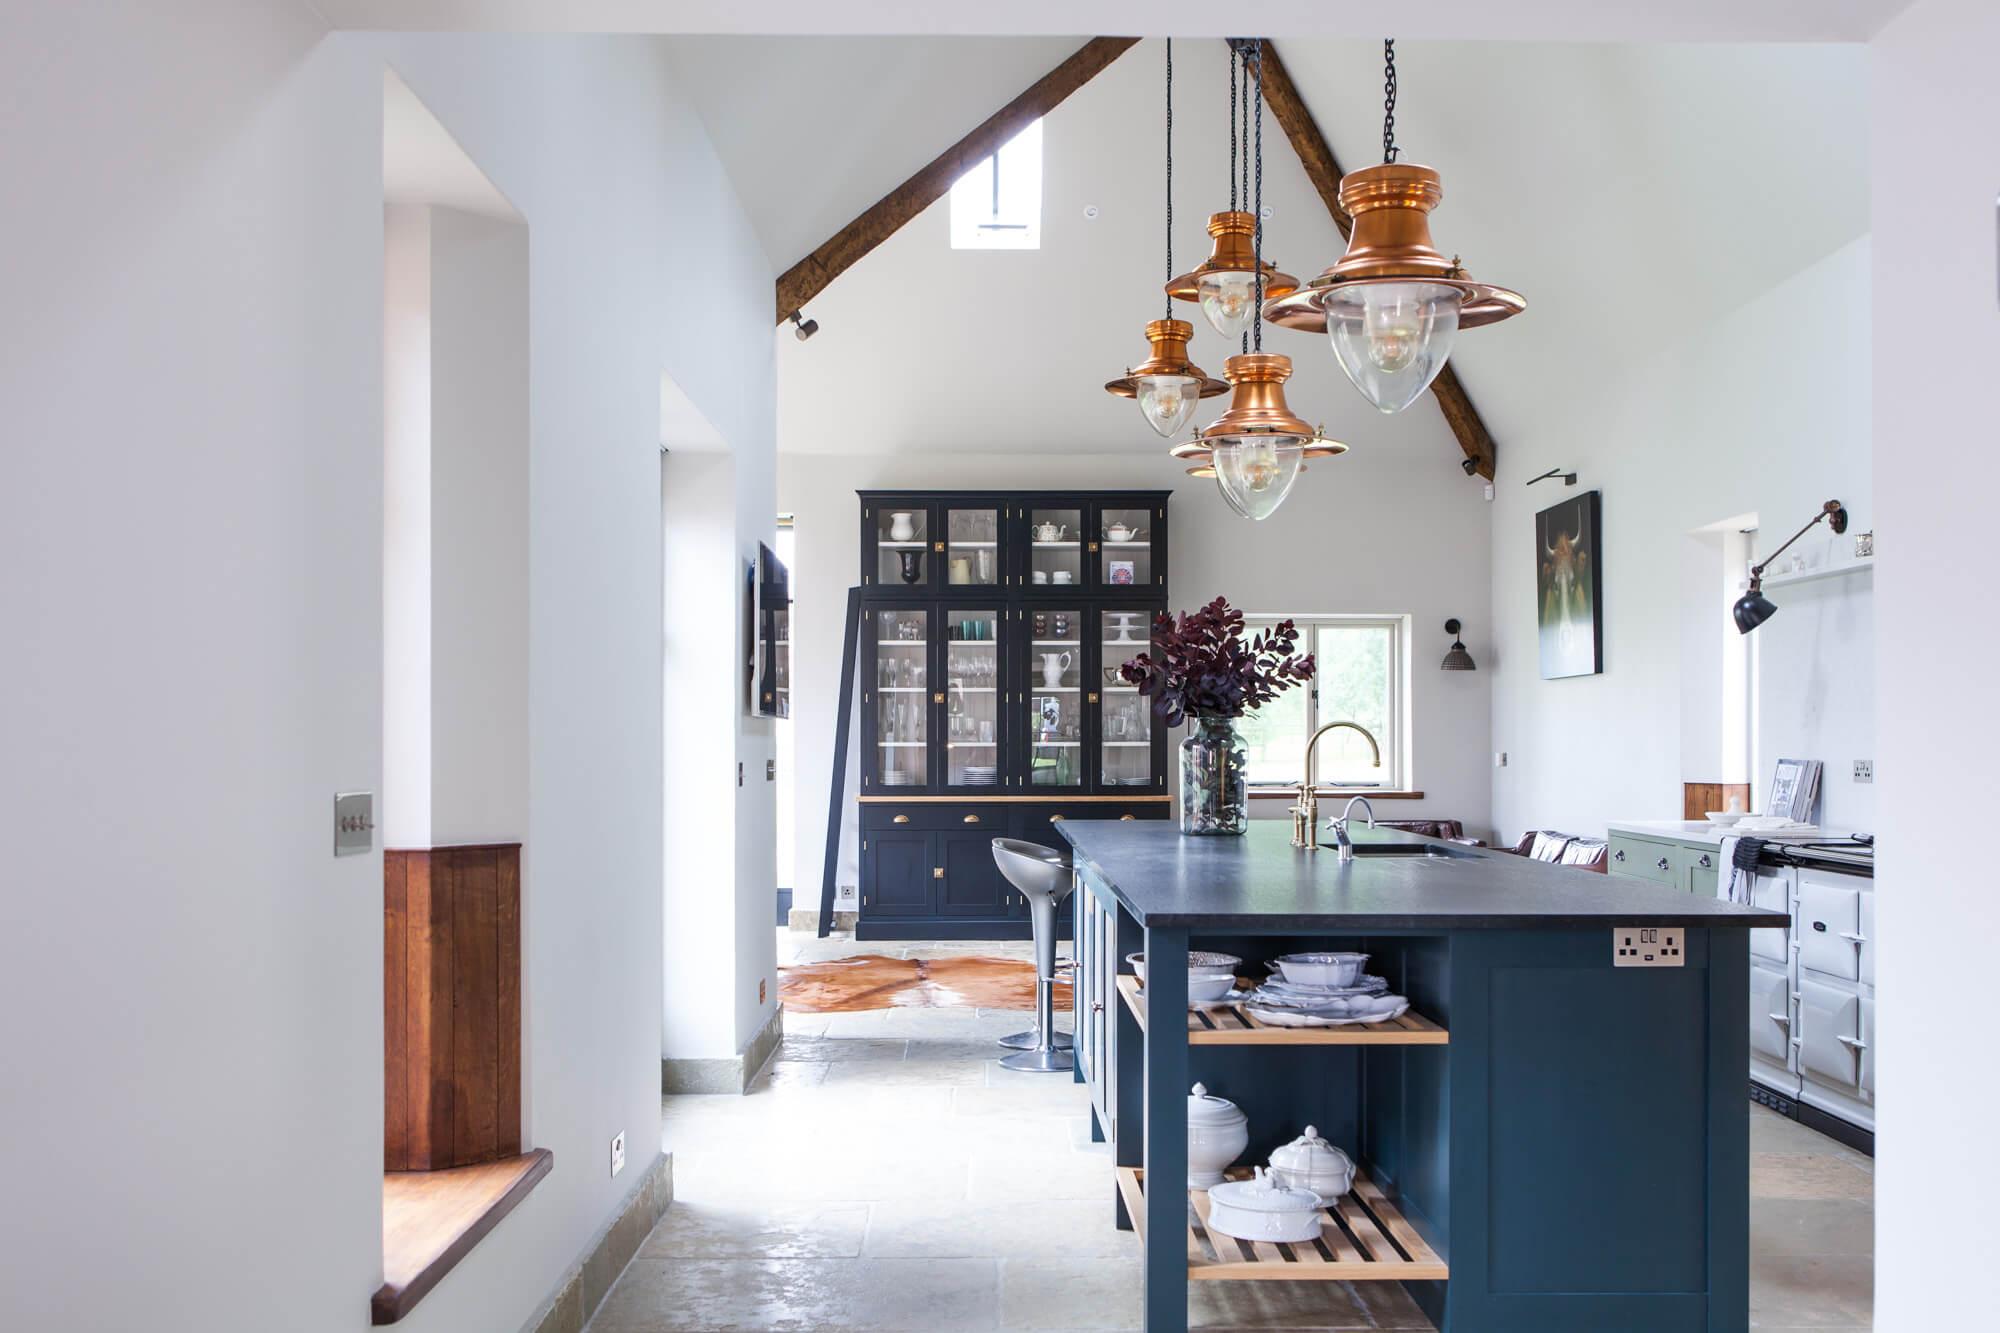 kitchen dinner Dorset- Interior photographer